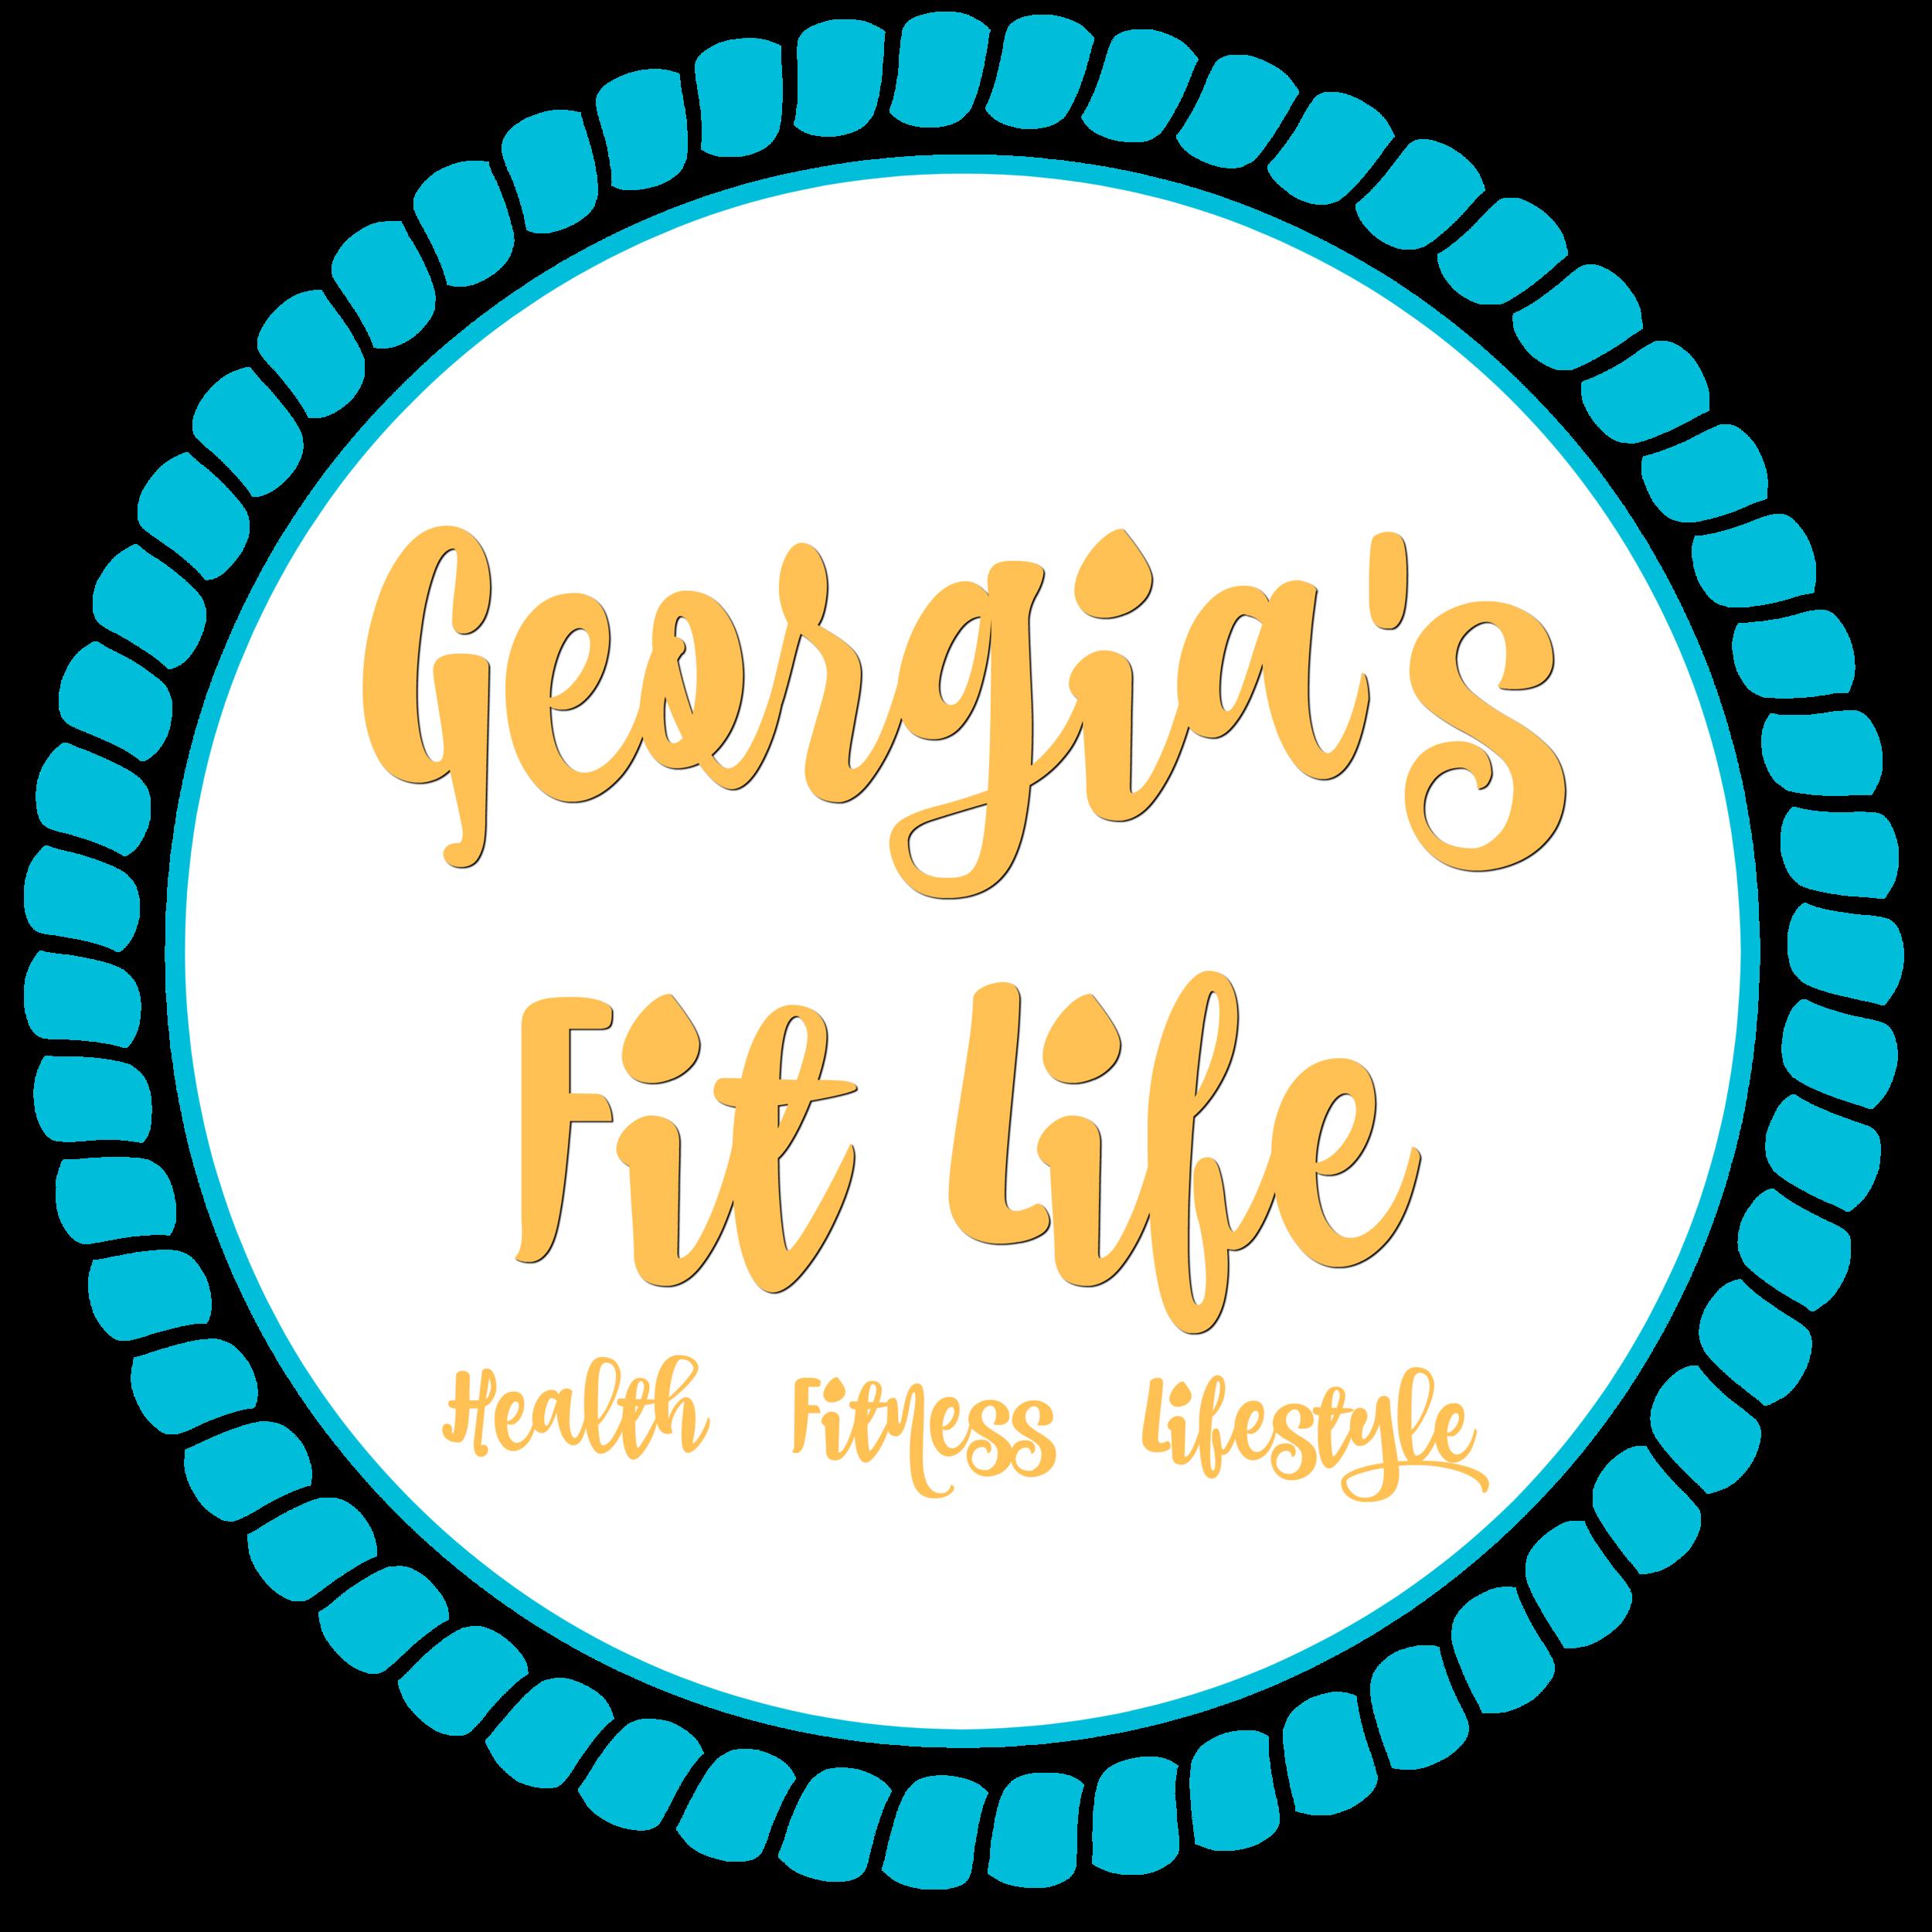 Georgias Fit Life logo large Final.png